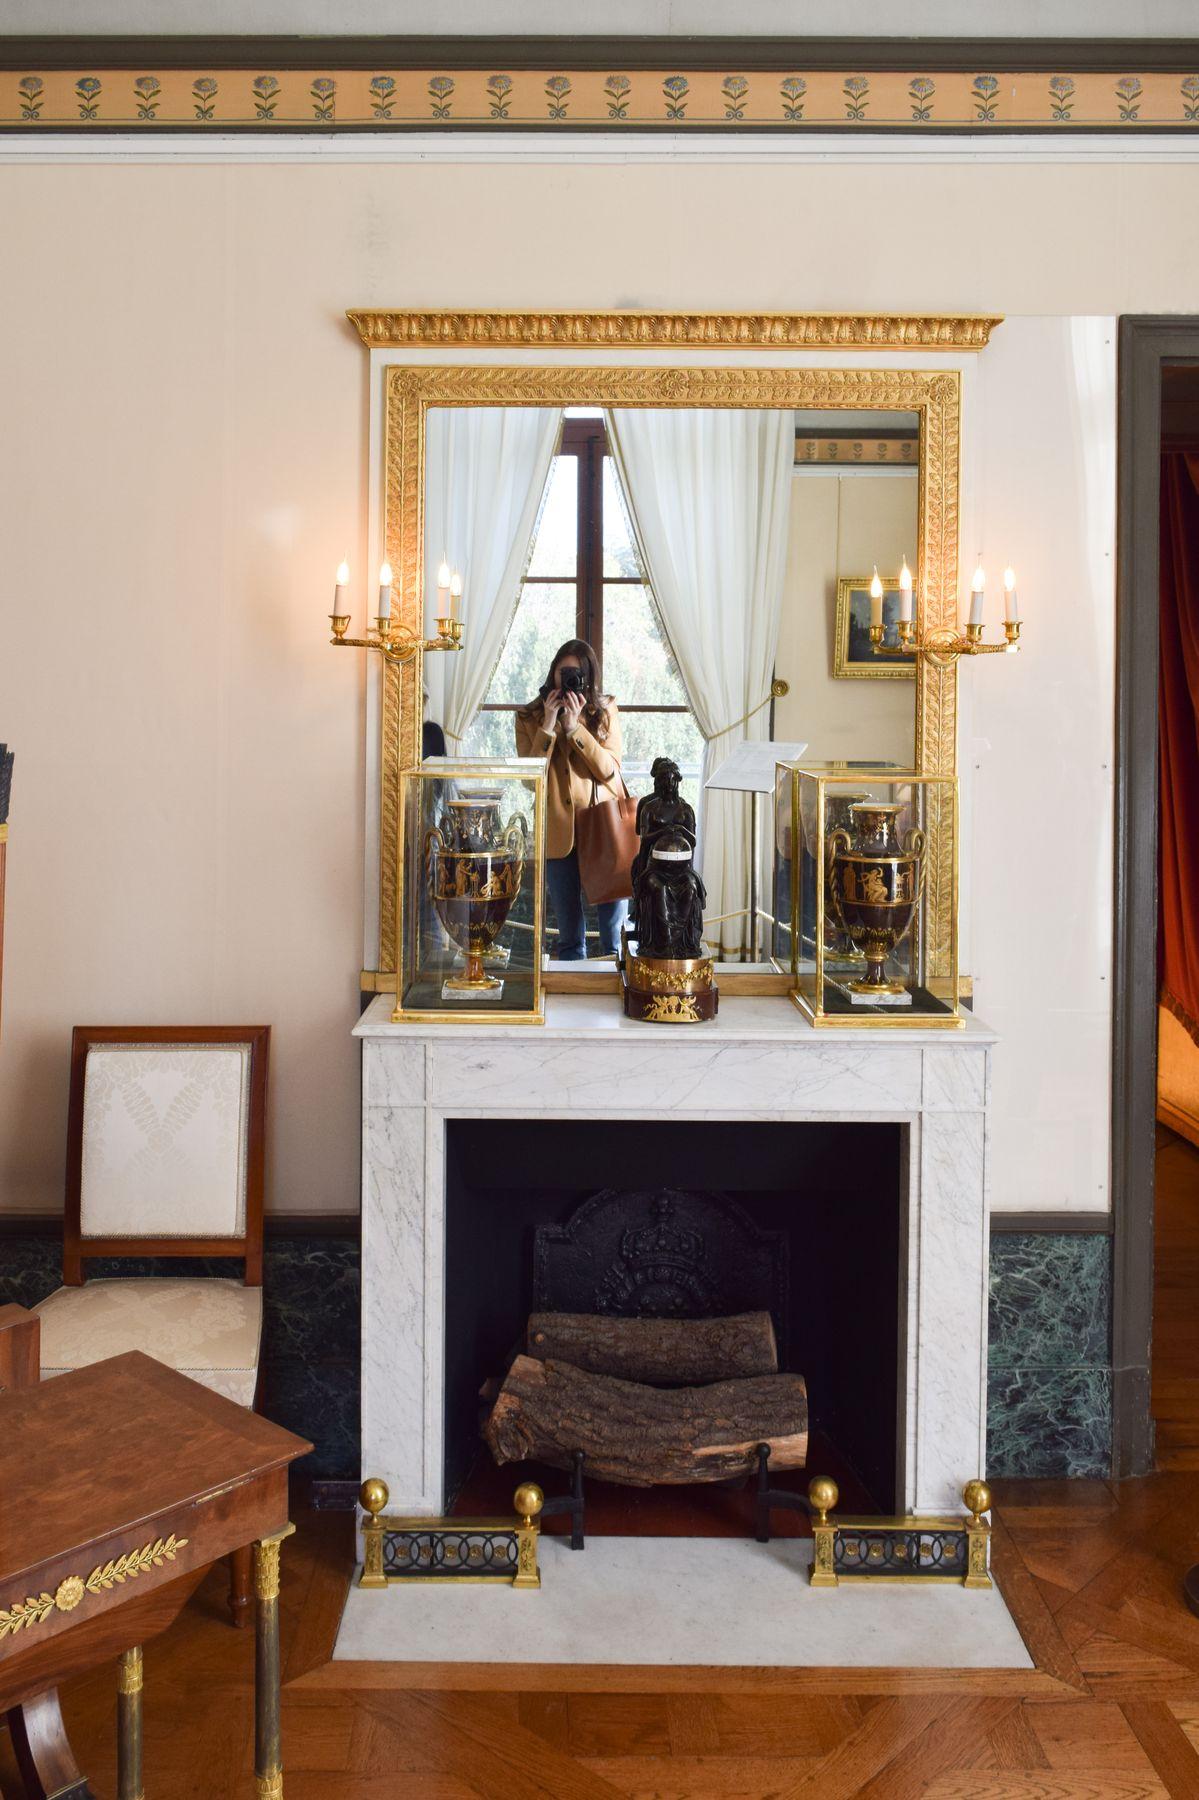 Château de Malmaison Fireplace French Mantel